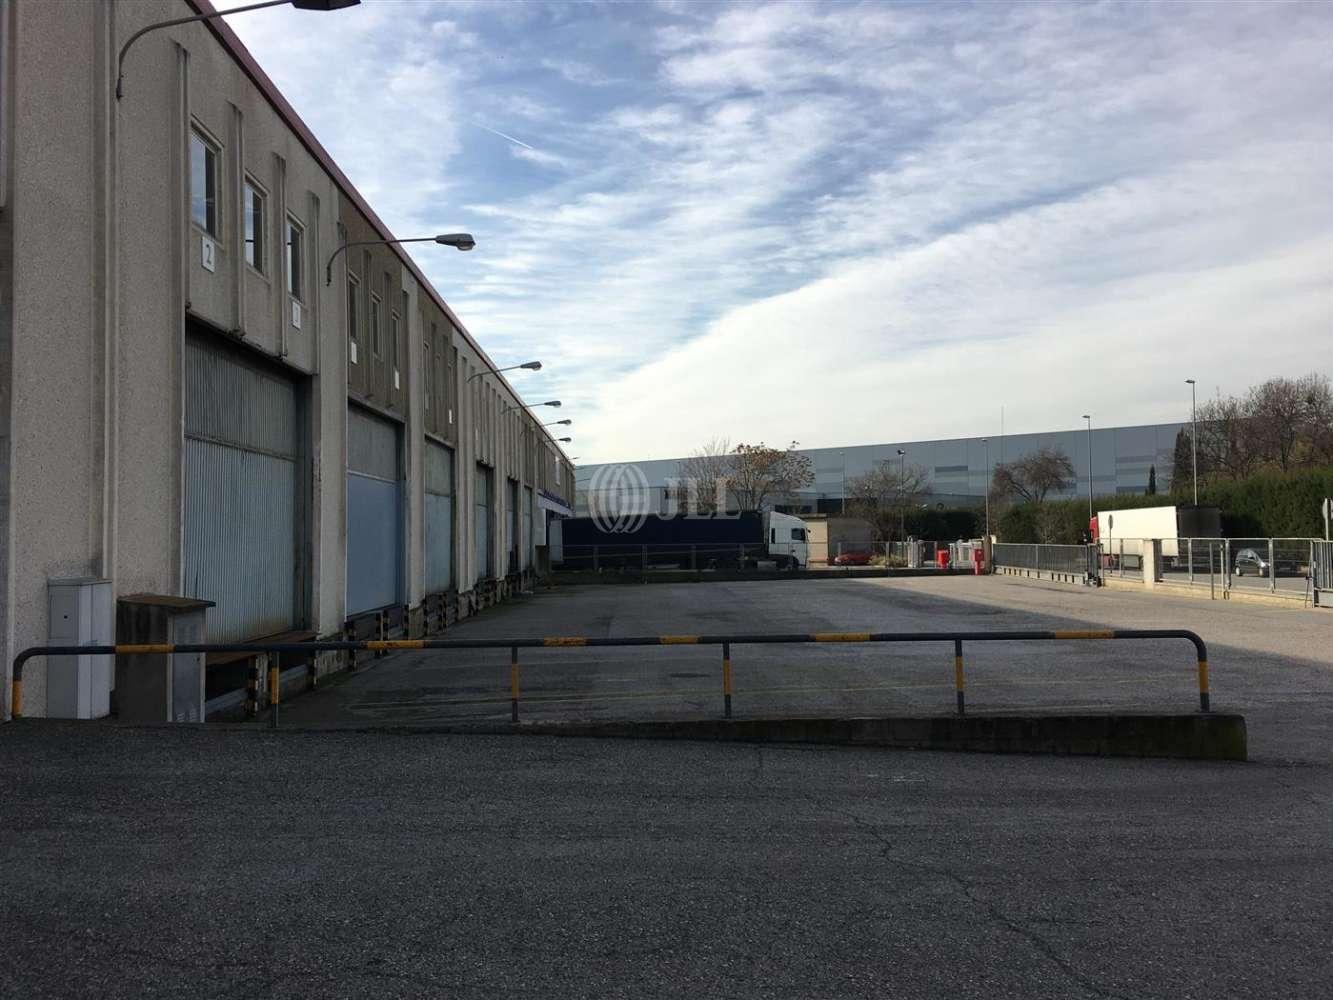 Naves industriales y logísticas Parets del vallès, 08150 - Nave Industrial - B0131 P.I CAN VOLART - 23957